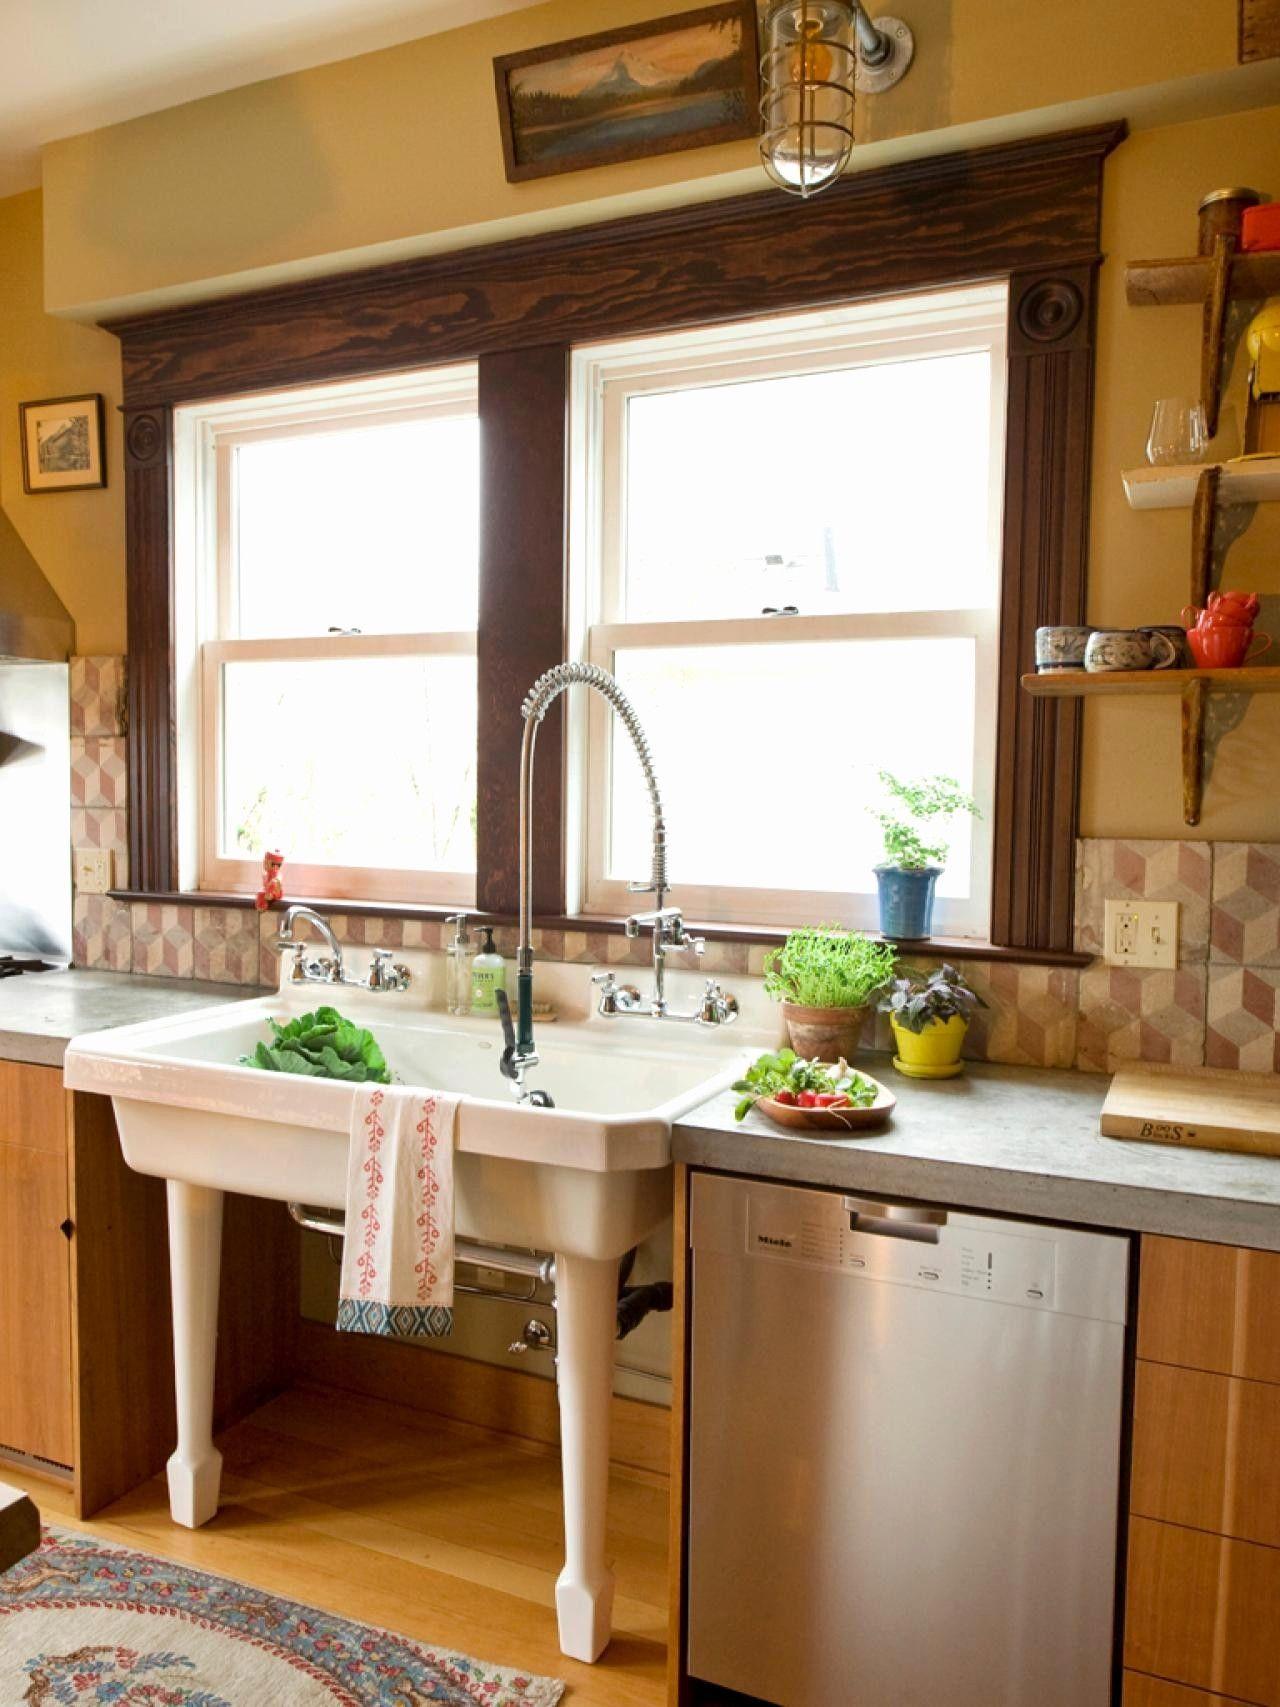 Beautiful Revit Kitchen Cabinets Kitchen Remodel Small Kitchen Layout Vintage Kitchen Sink